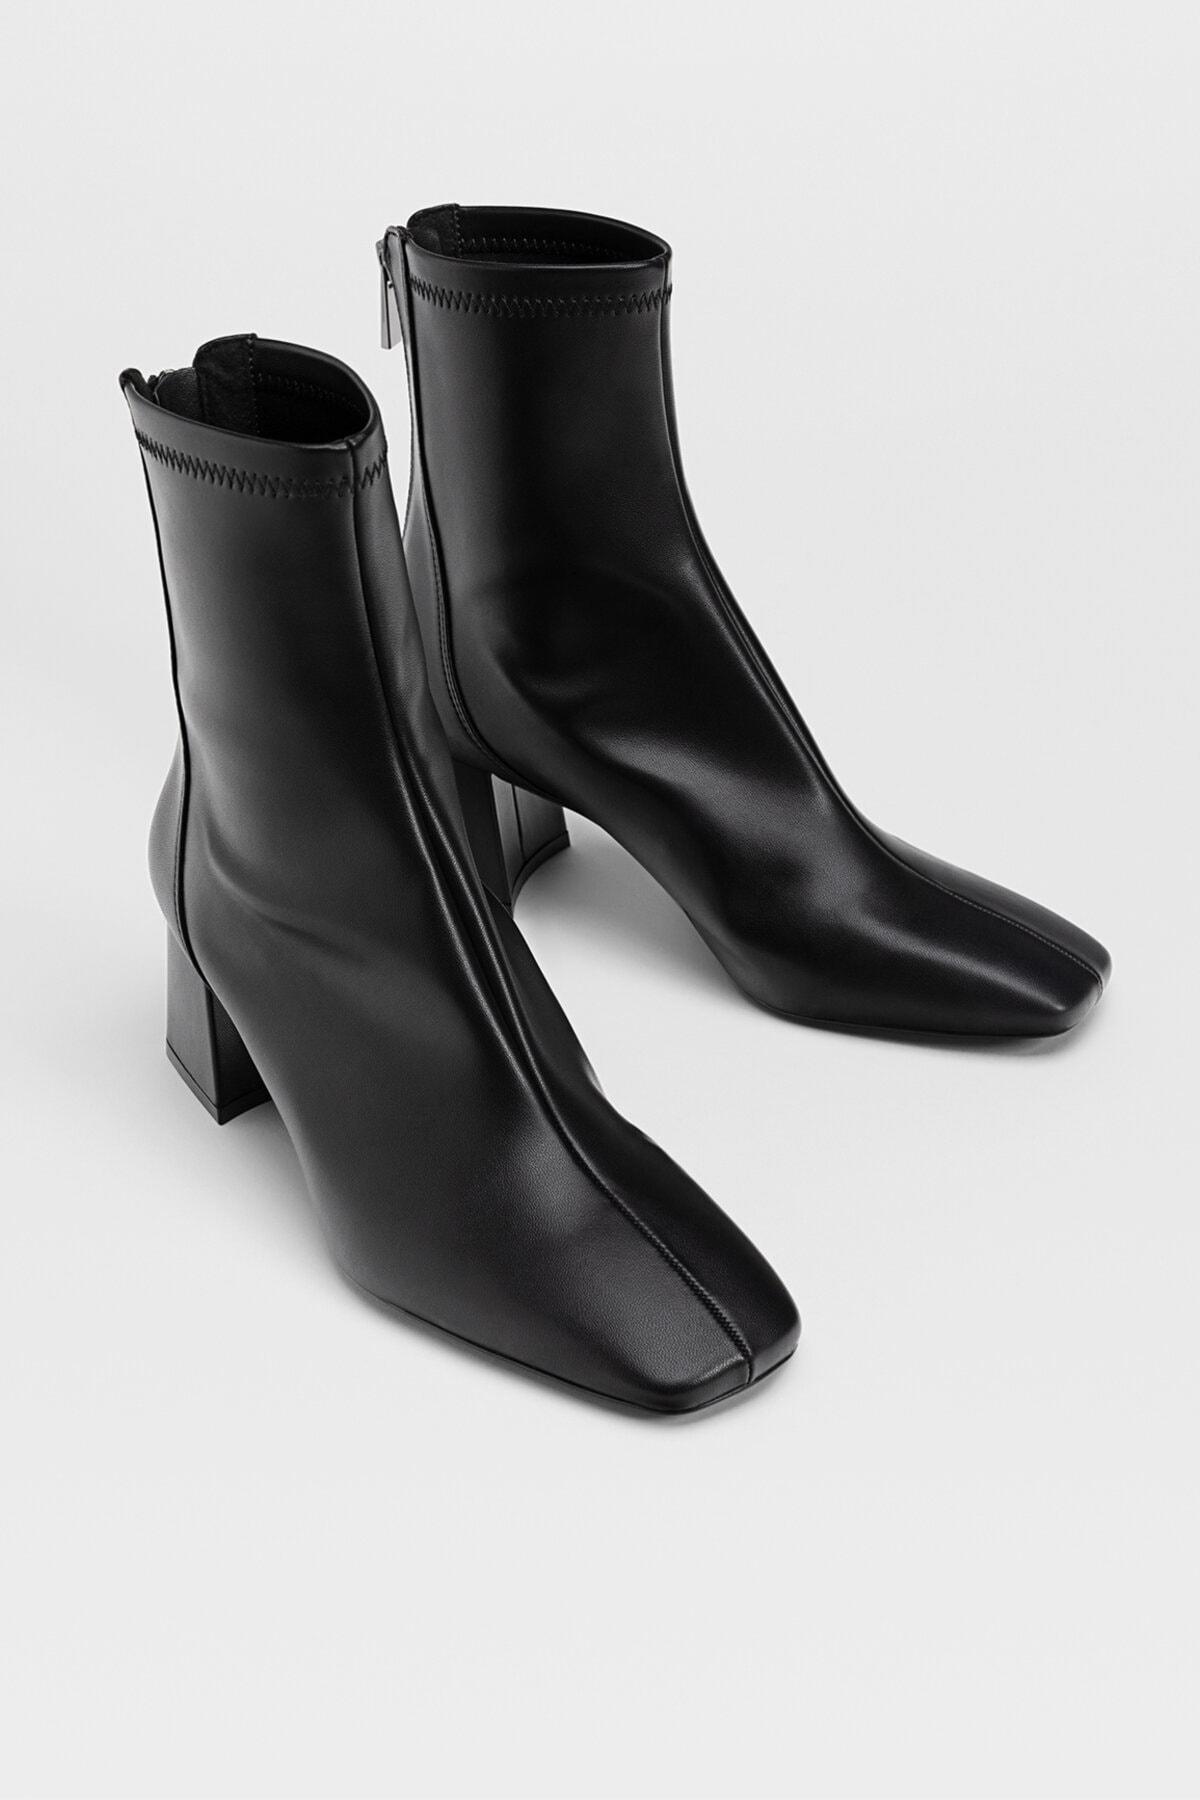 Stradivarius Kadın Siyah Streç Bilekli Orta Boy Topuklu Bot 19902670 2